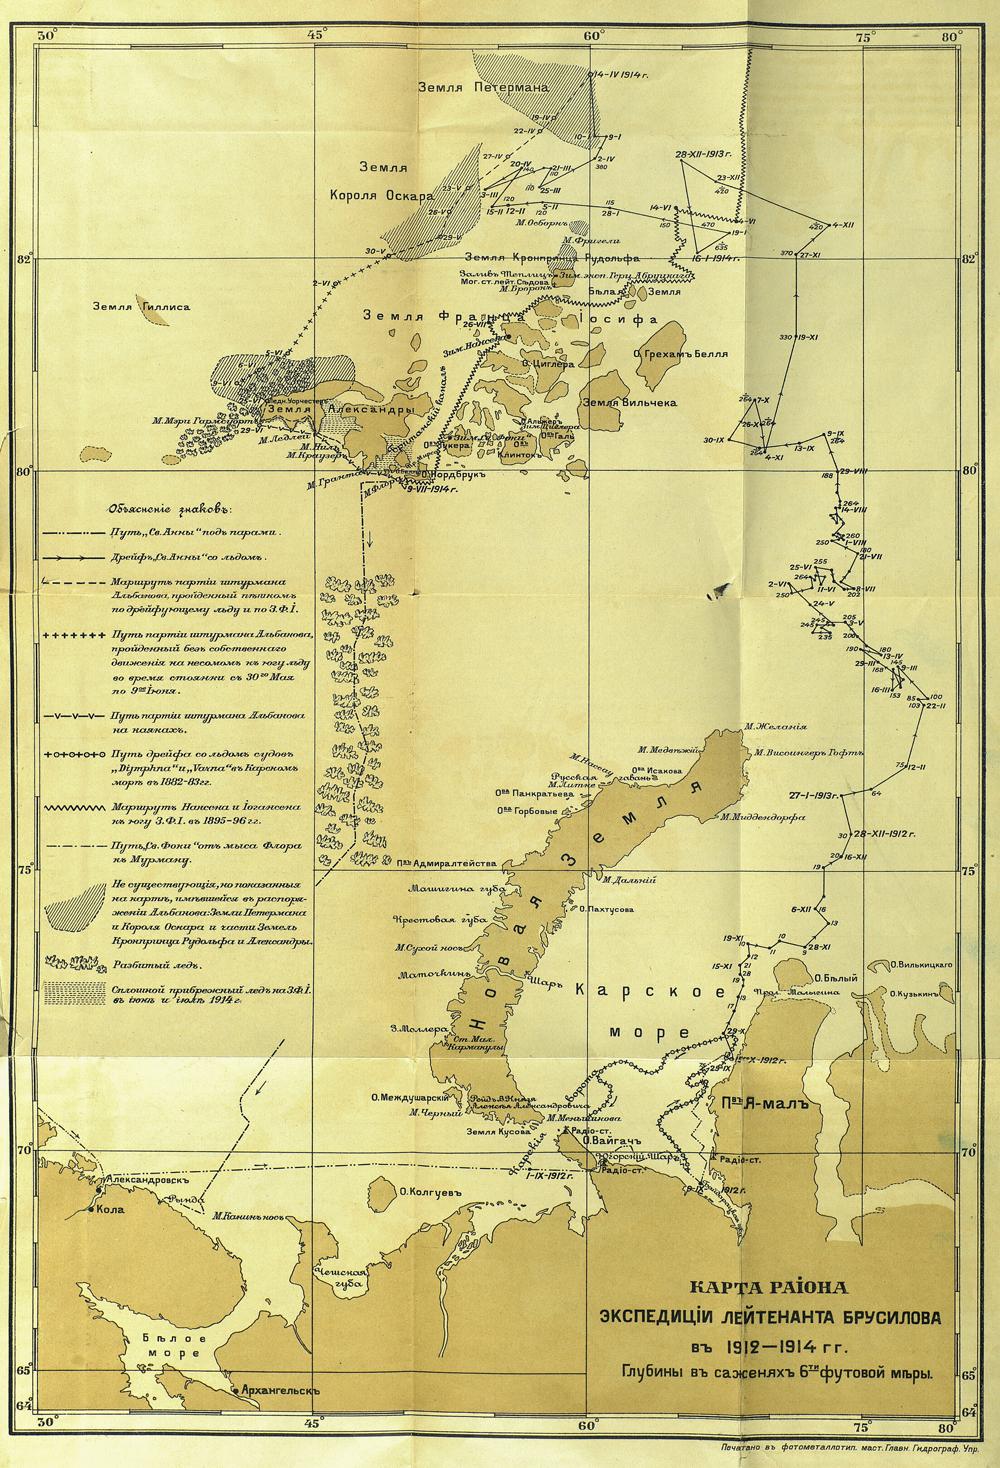 Карта района экспедиции лейтенанта Брусилова в 1912—1914 гг. из книги В. И. Альбанова «На юг к Земле Франца Иосифа!» — Петроград, 1917 год.